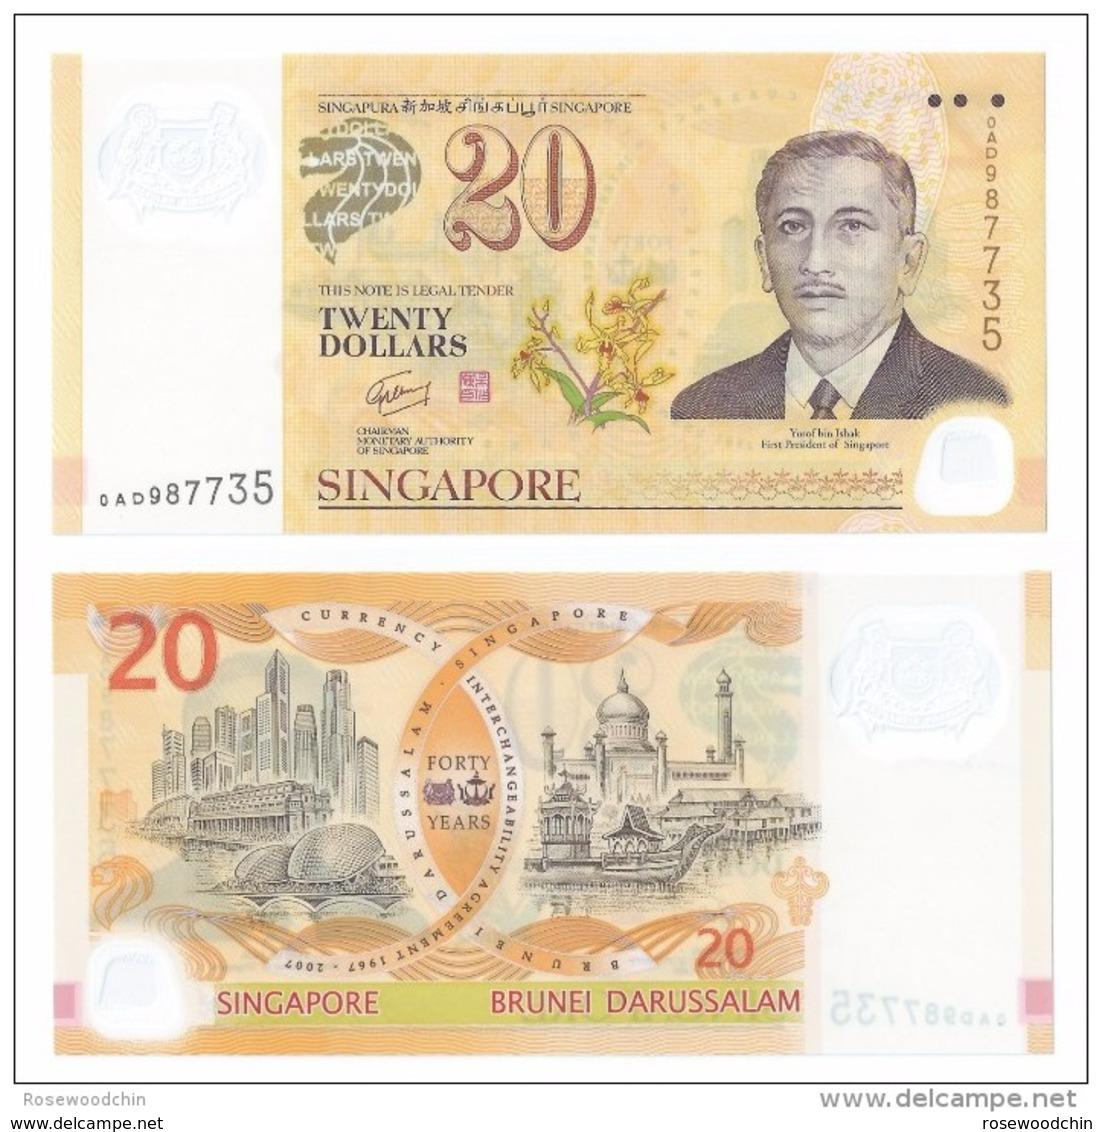 2007 SINGAPORE BRUNEI 40th ANNIVERSARY $20  POLYMER BANKNOTE  NEW UNC  (#77) - Singapore